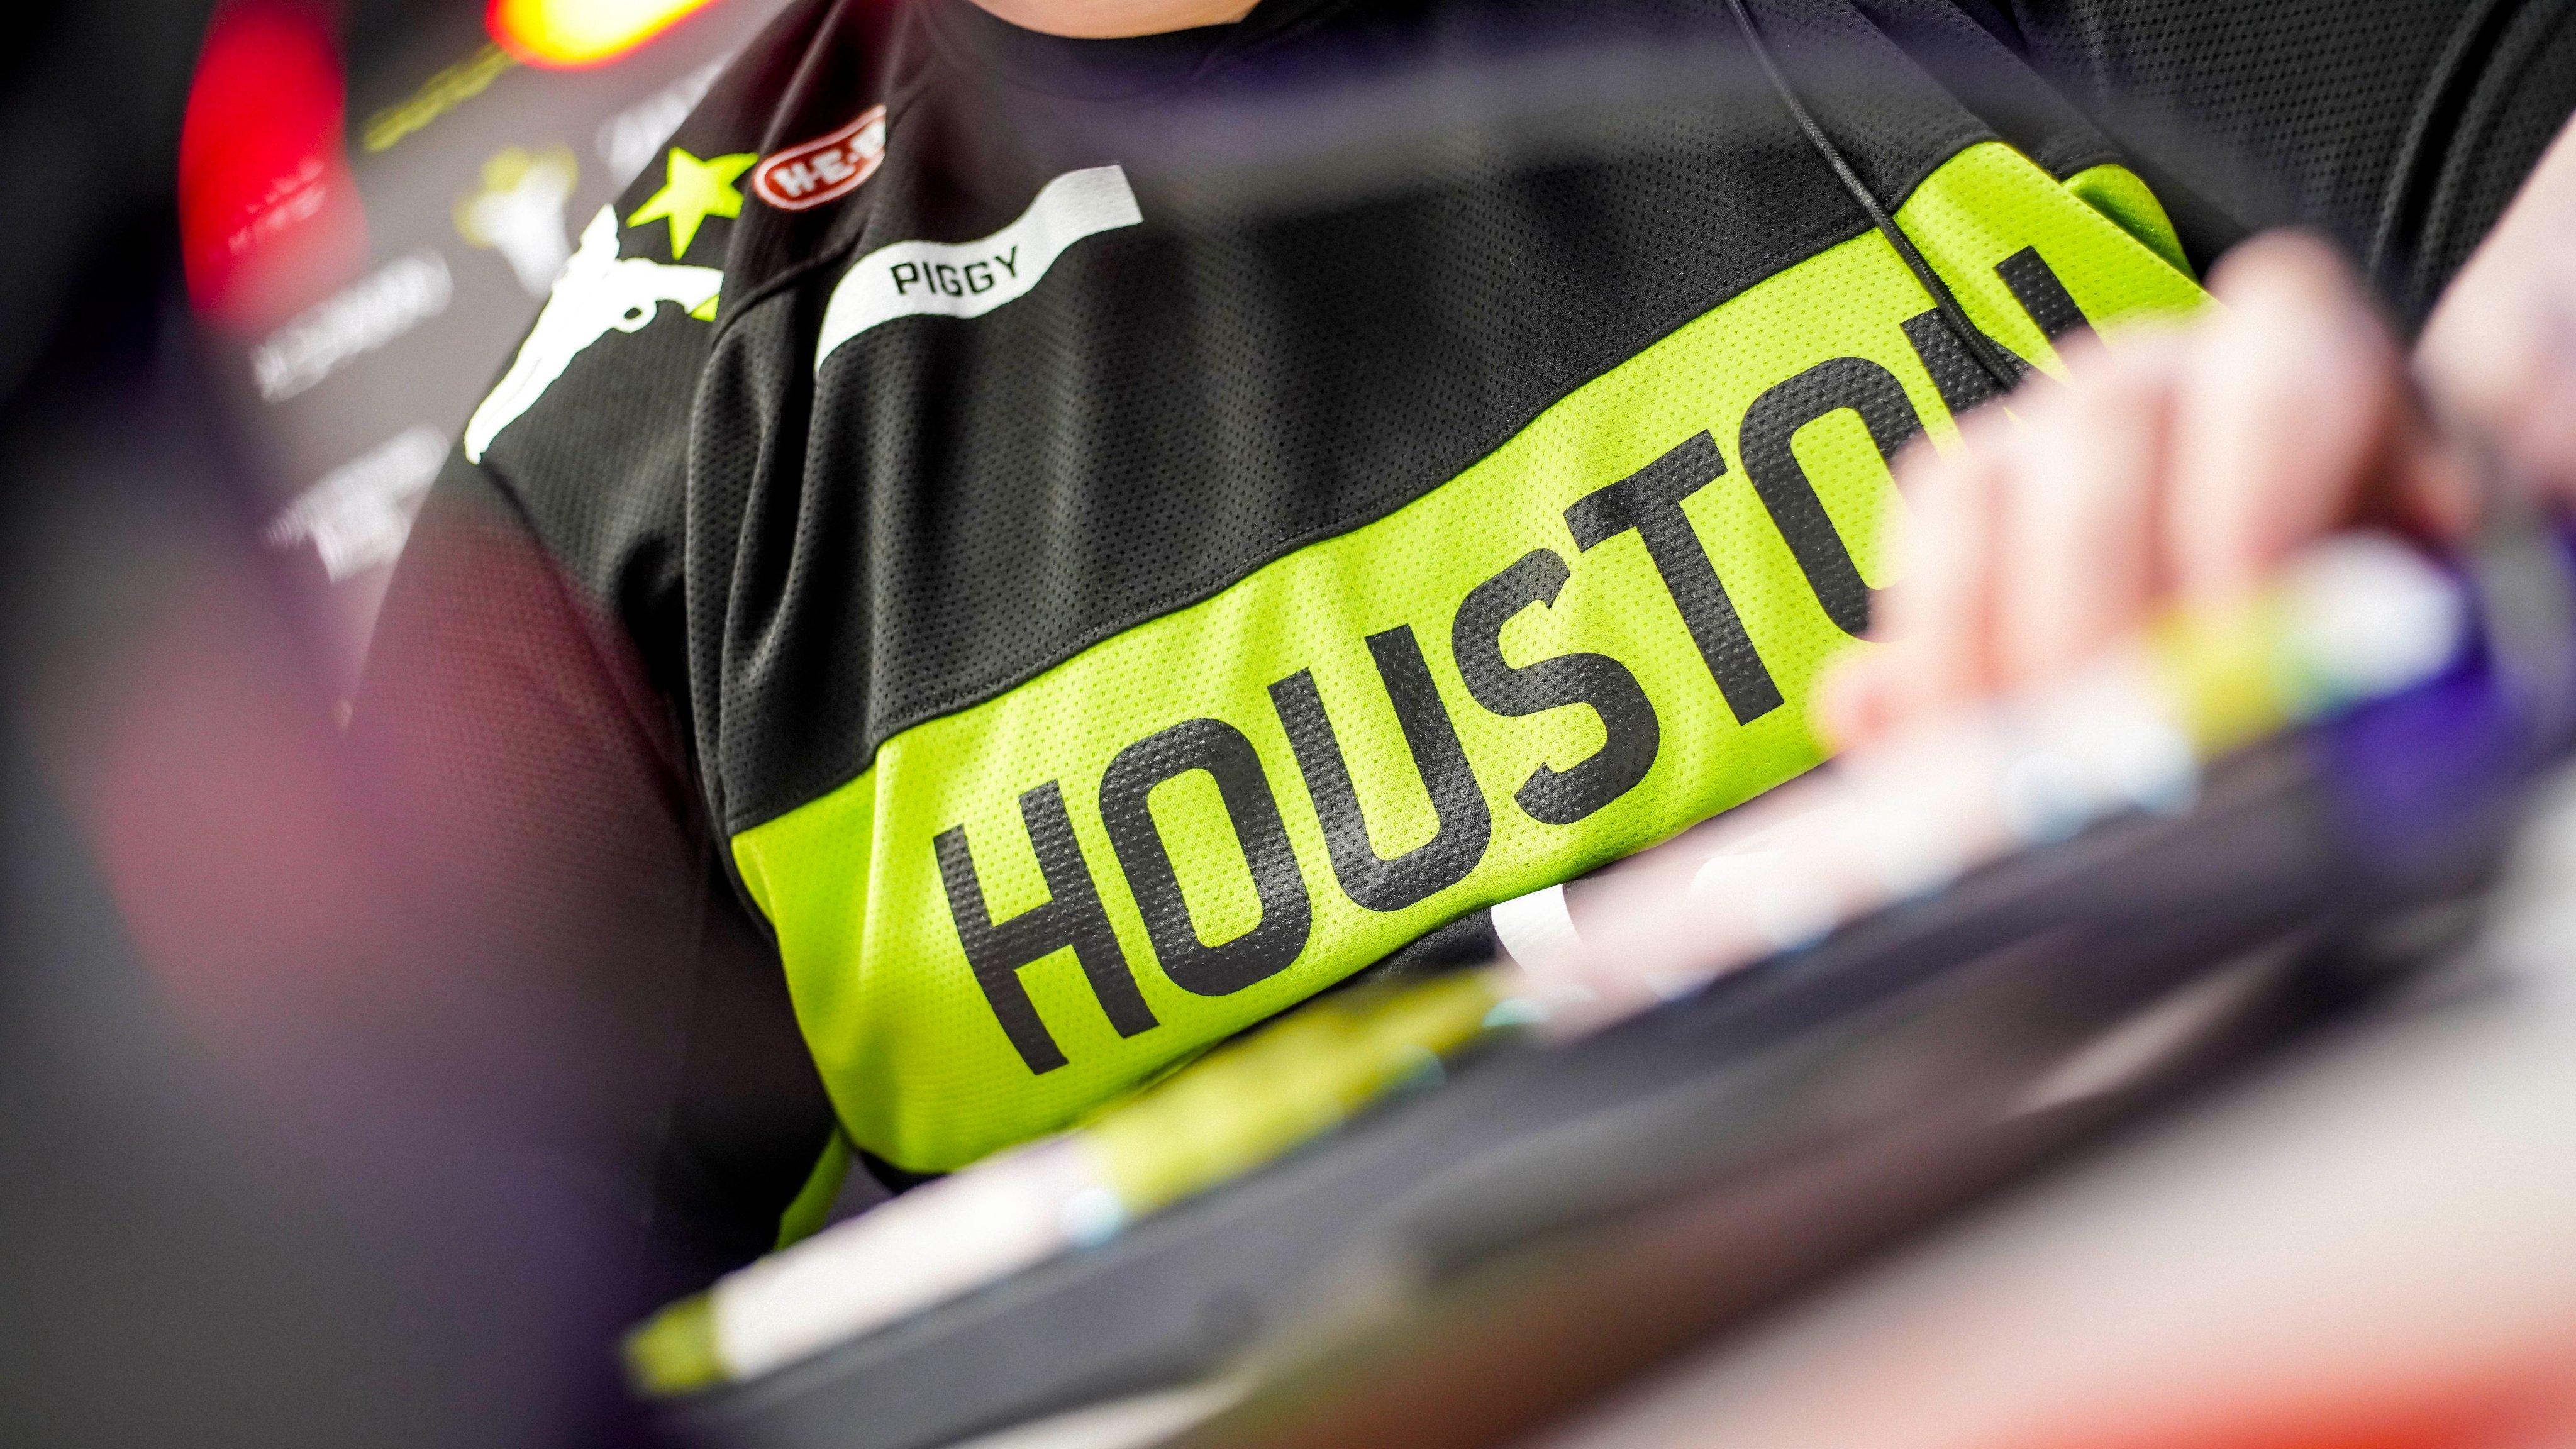 Piggy Houston Outlaws Fourth Battle For Texas